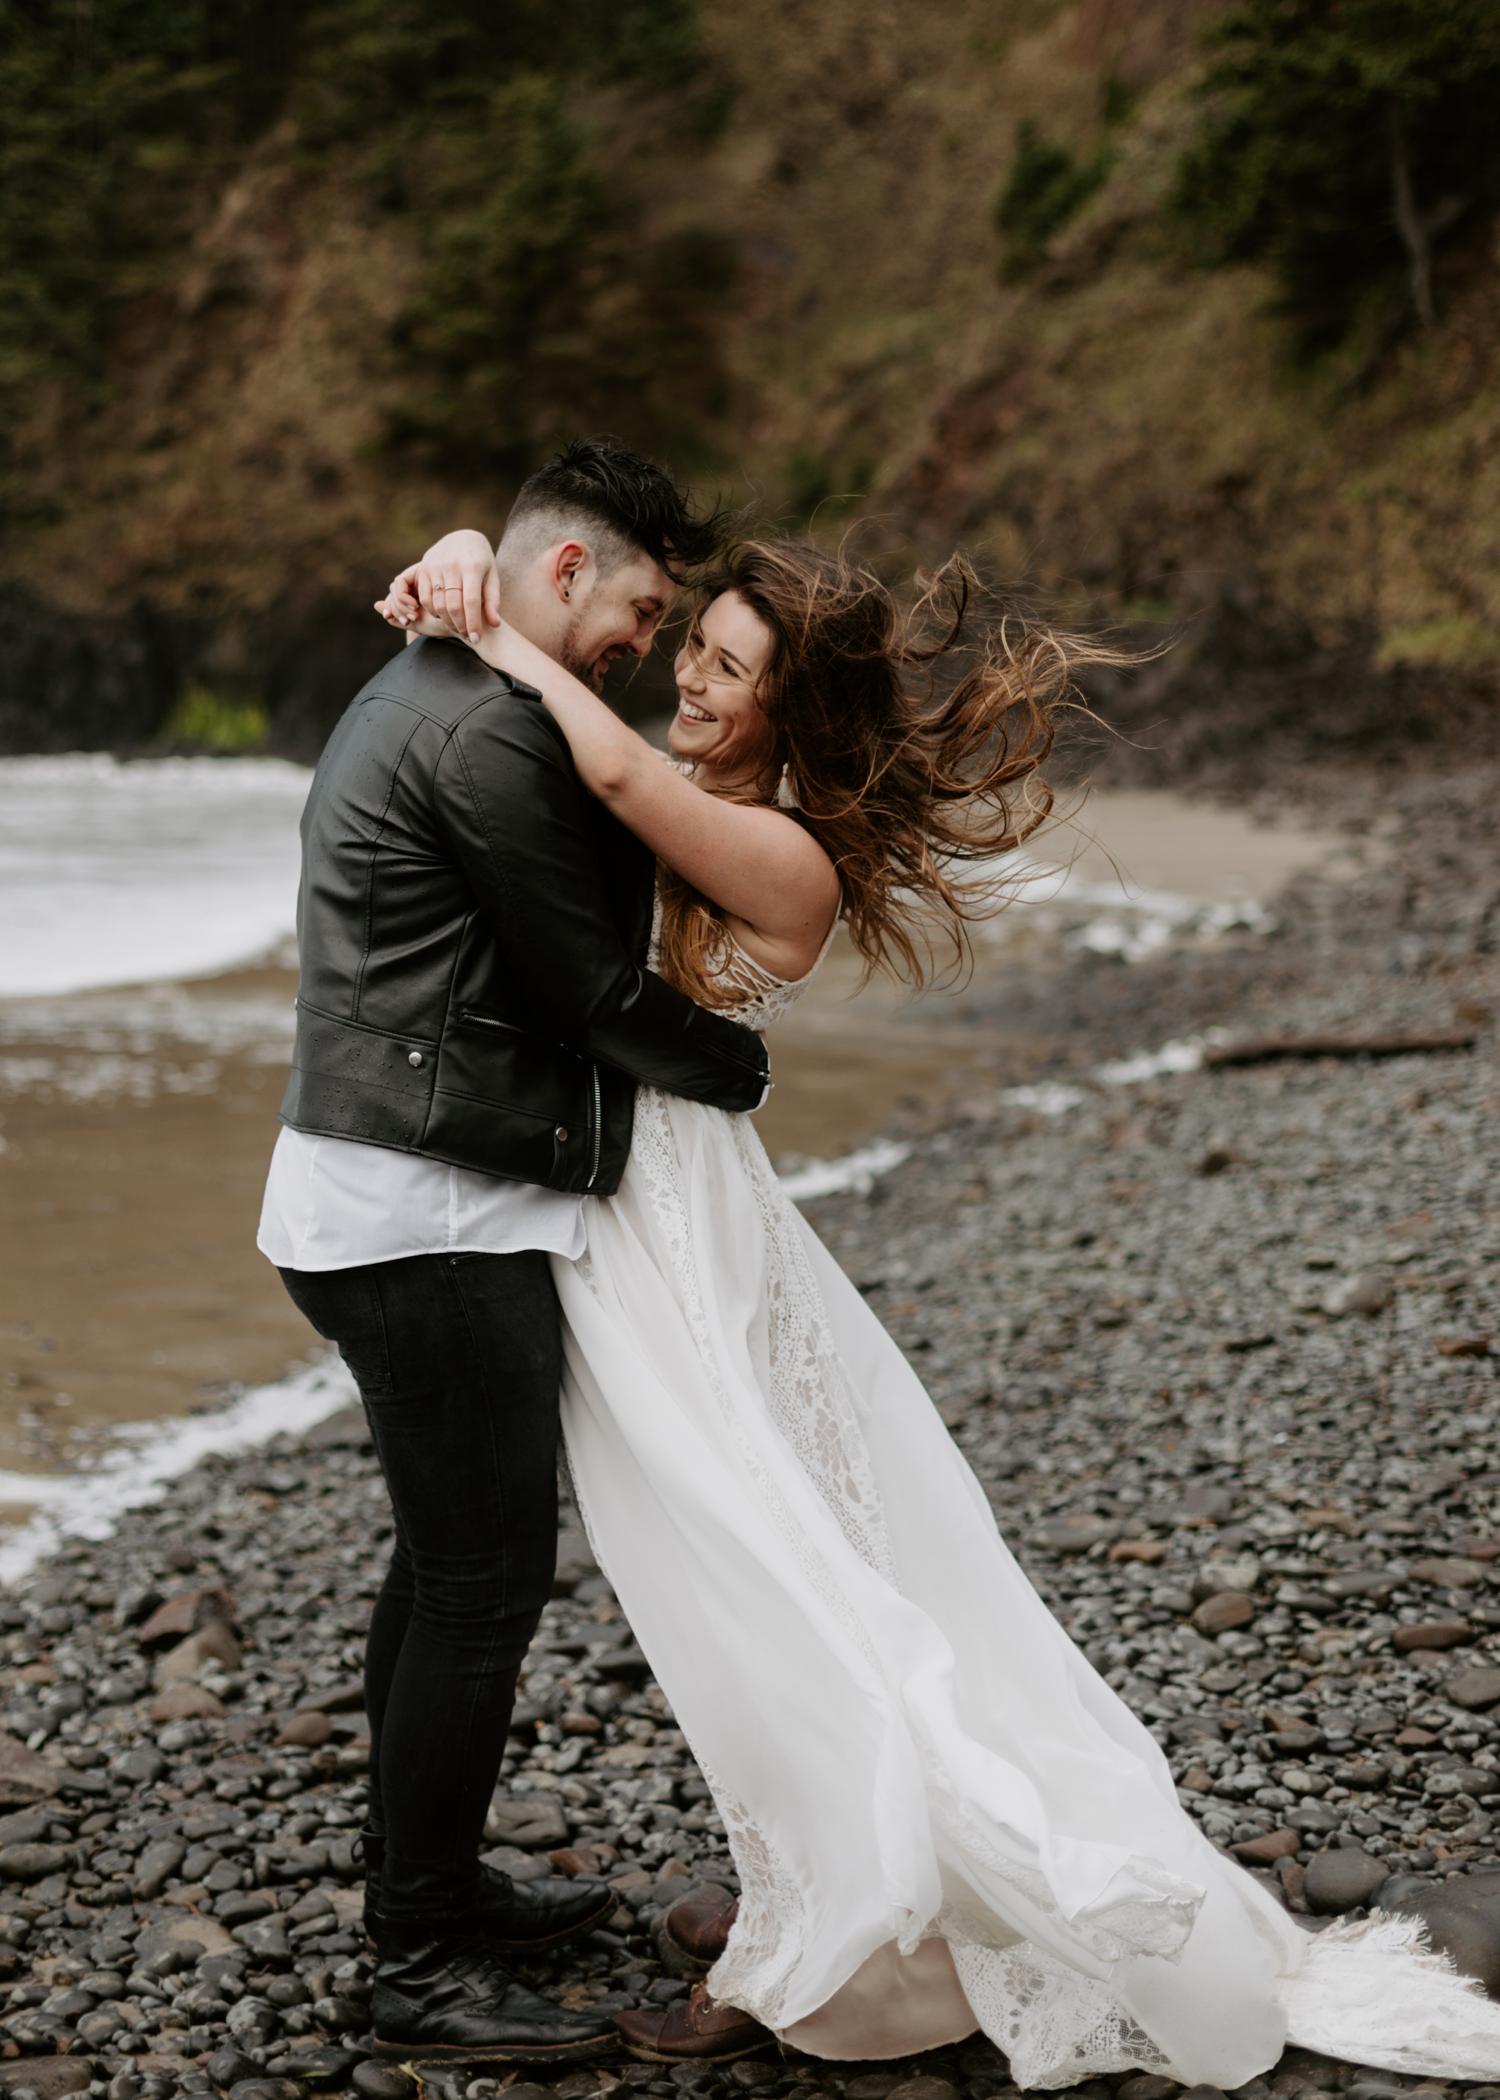 intimate-oregon-coast-elopement-2018-04-26_0021.jpg